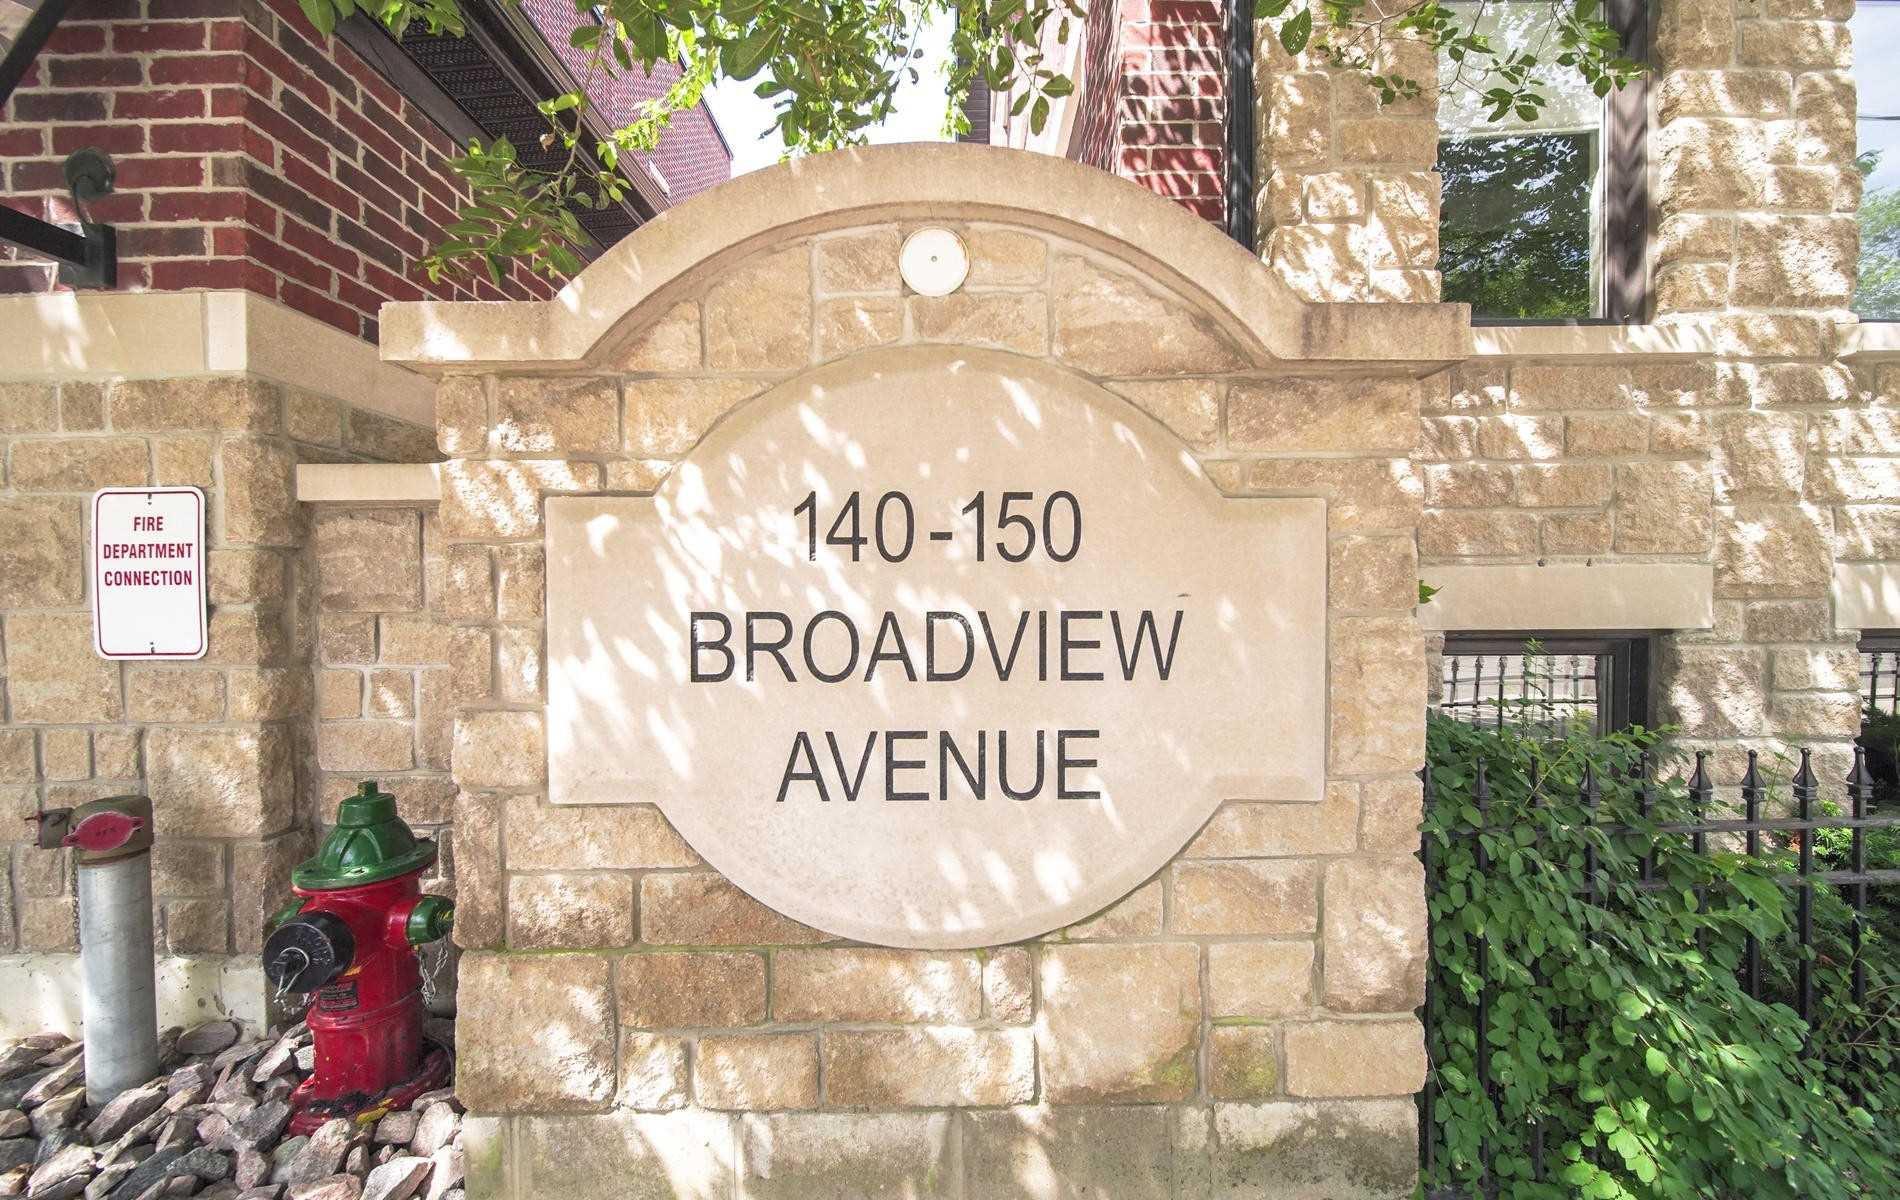 Photo 14: Photos: Th 11 150 Broadview Avenue in Toronto: South Riverdale Condo for sale (Toronto E01)  : MLS®# E4519038